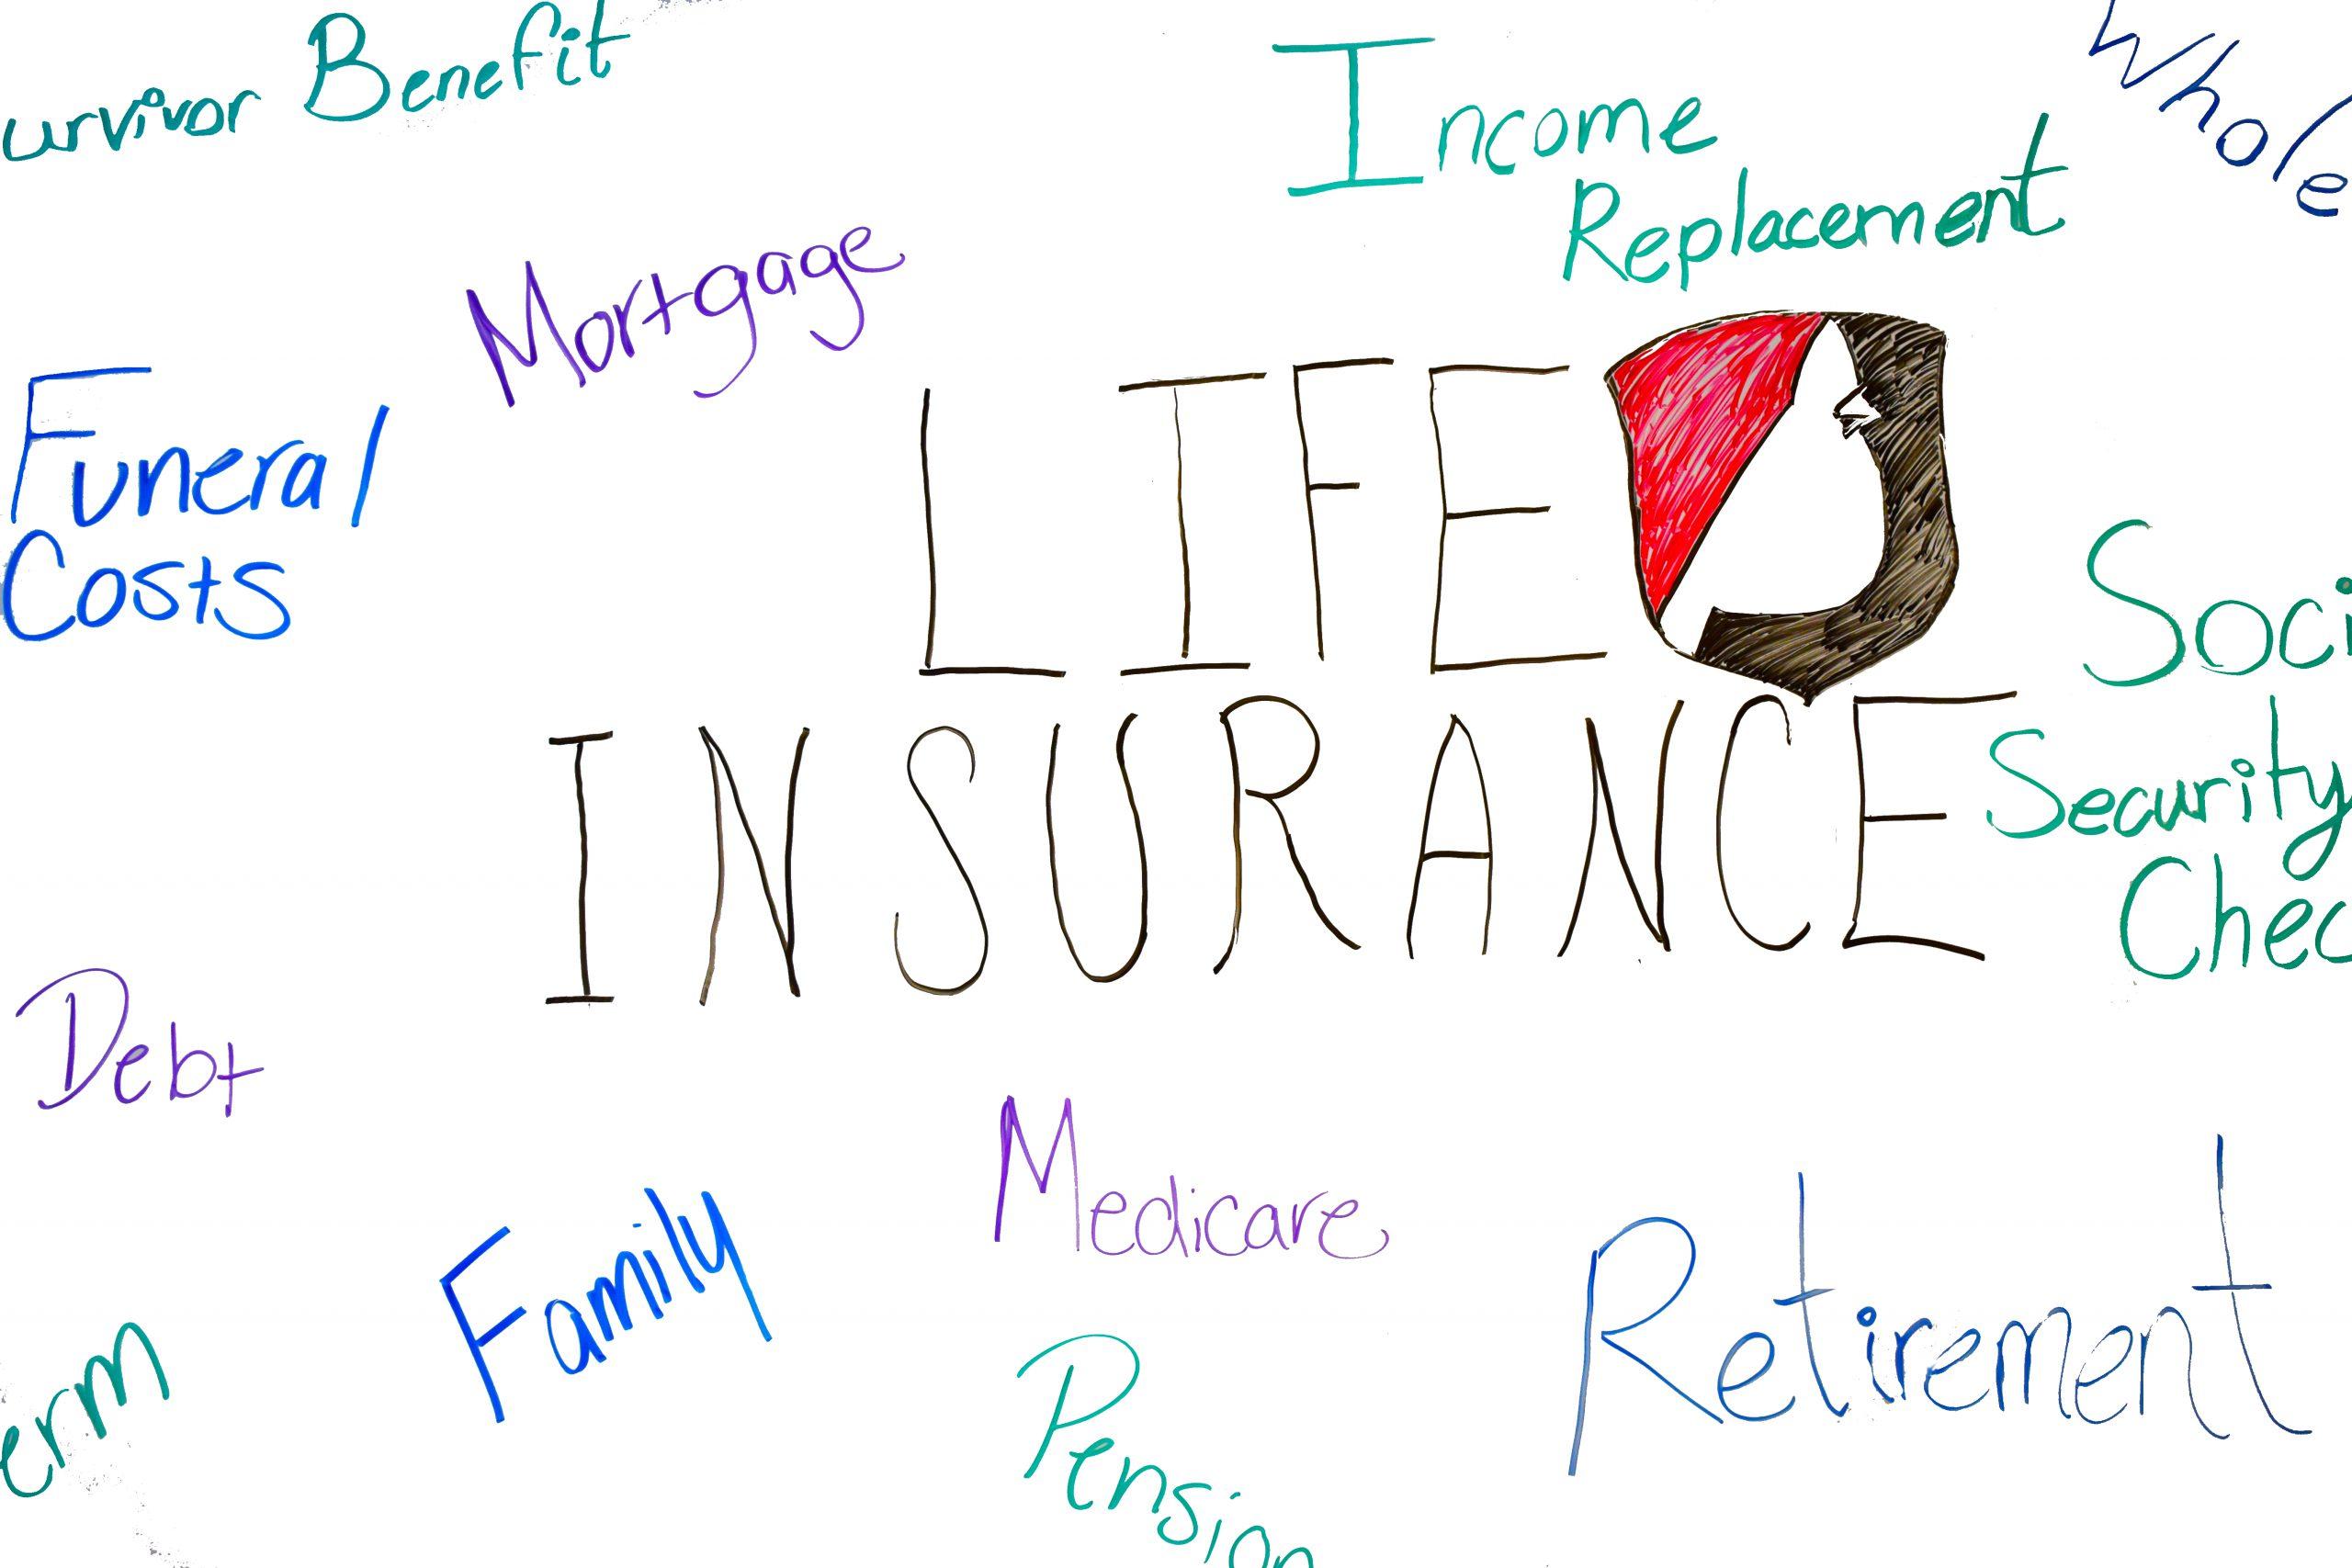 Life_Insruance_Retirement_Changes